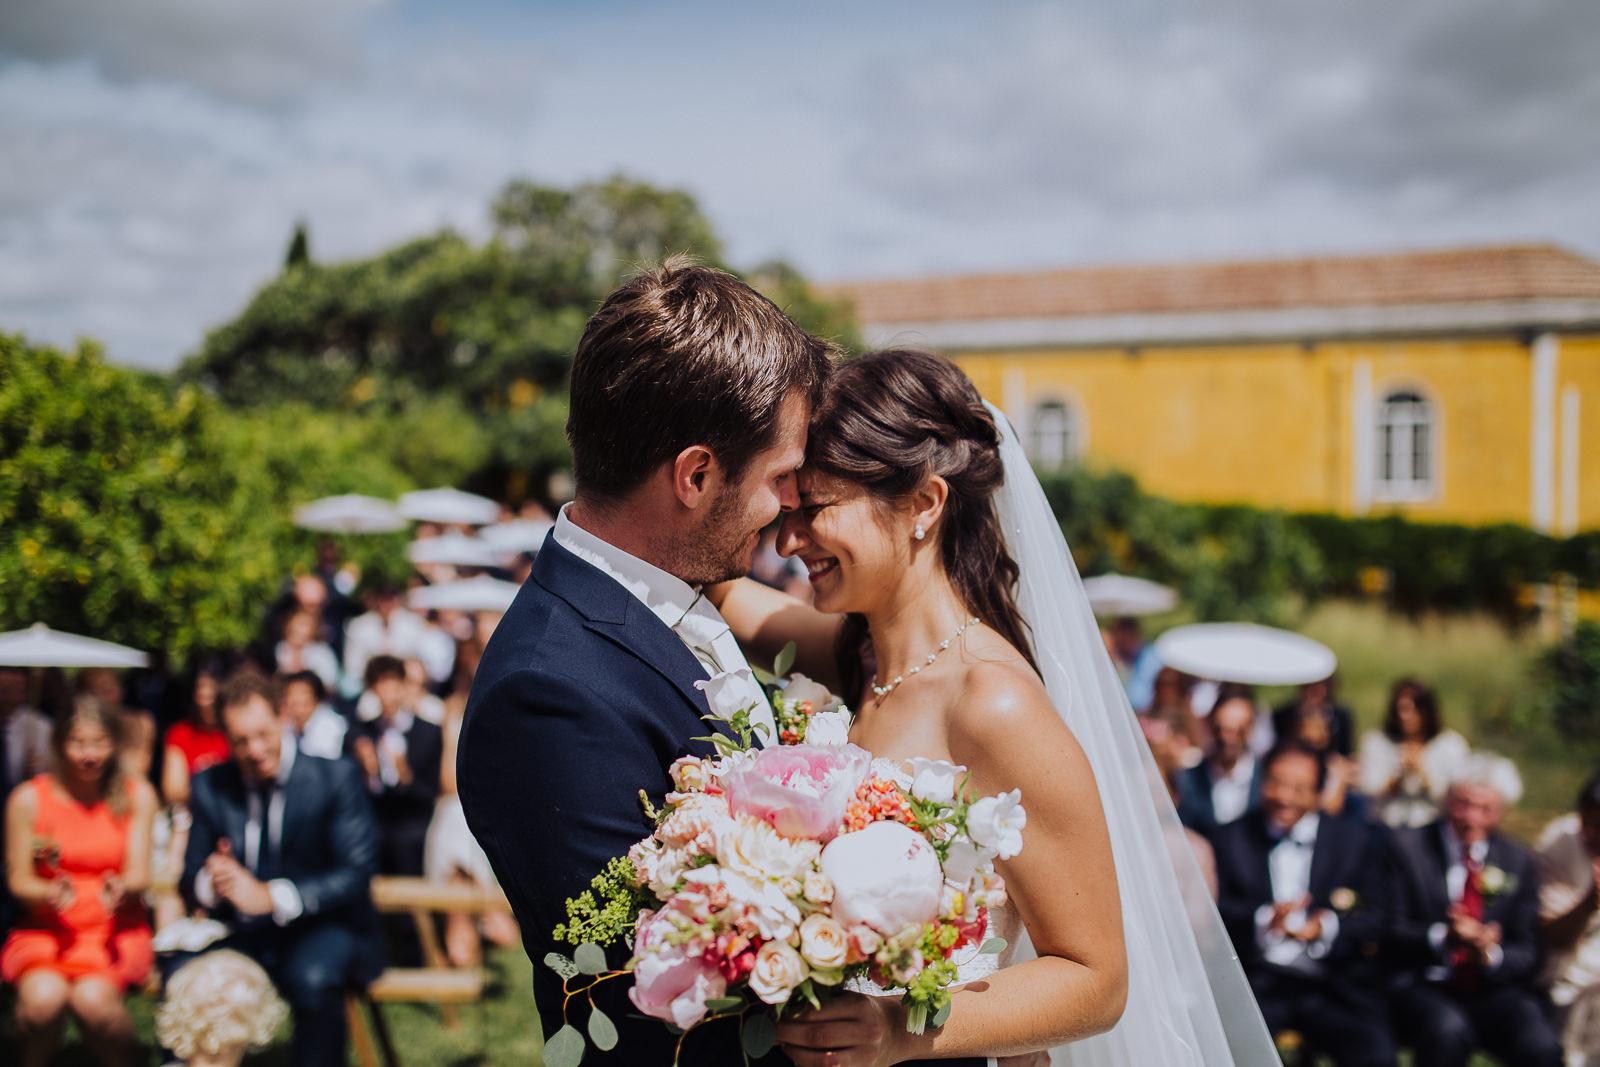 wedding_quinta_santana_mafra_portugal_041.jpg